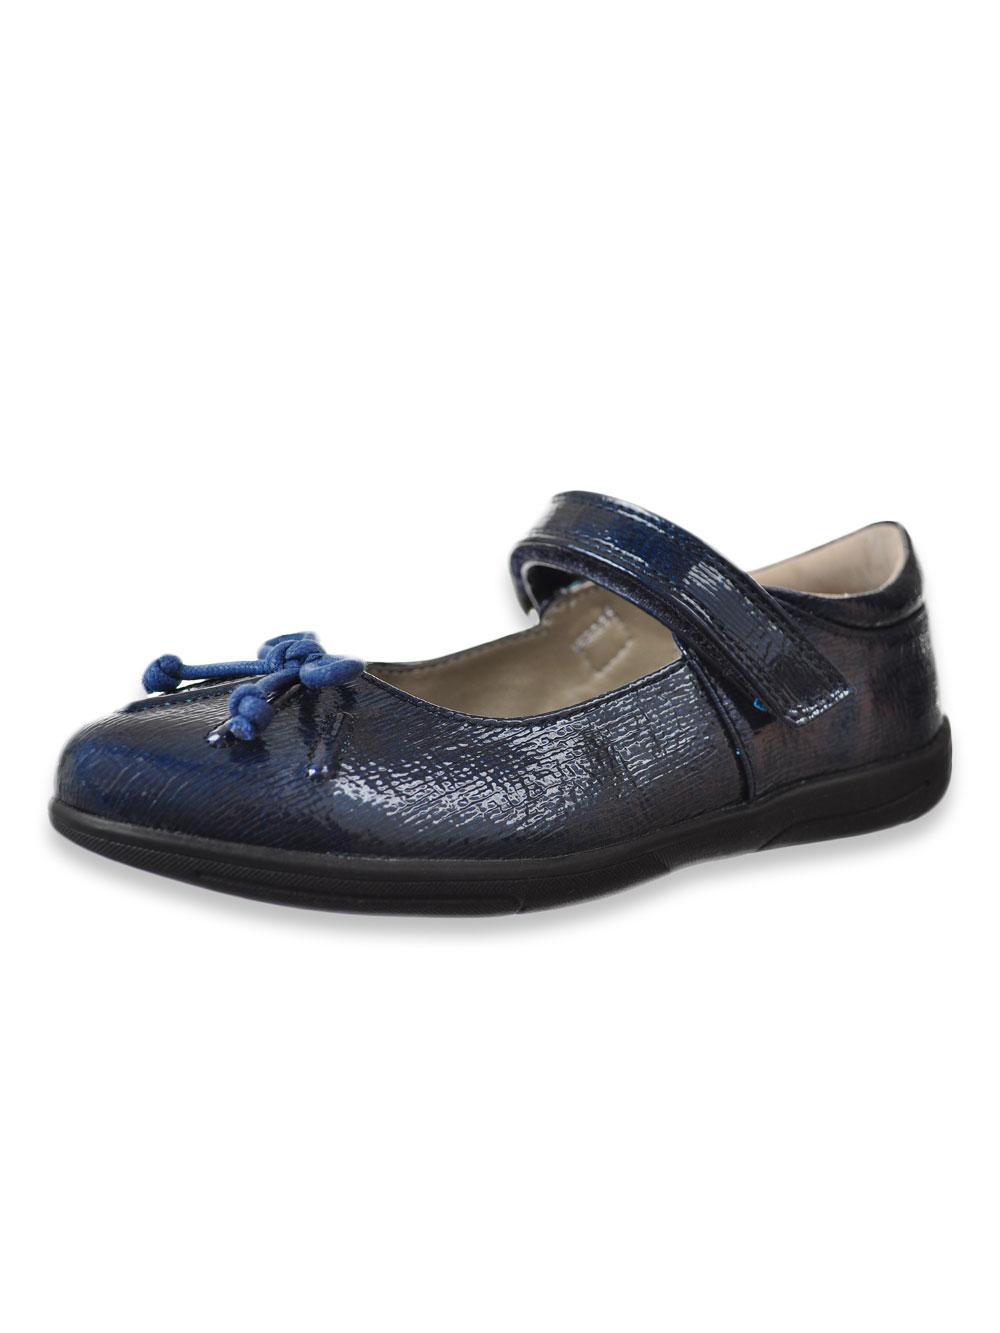 Girls' Alani School Shoes by Nina in